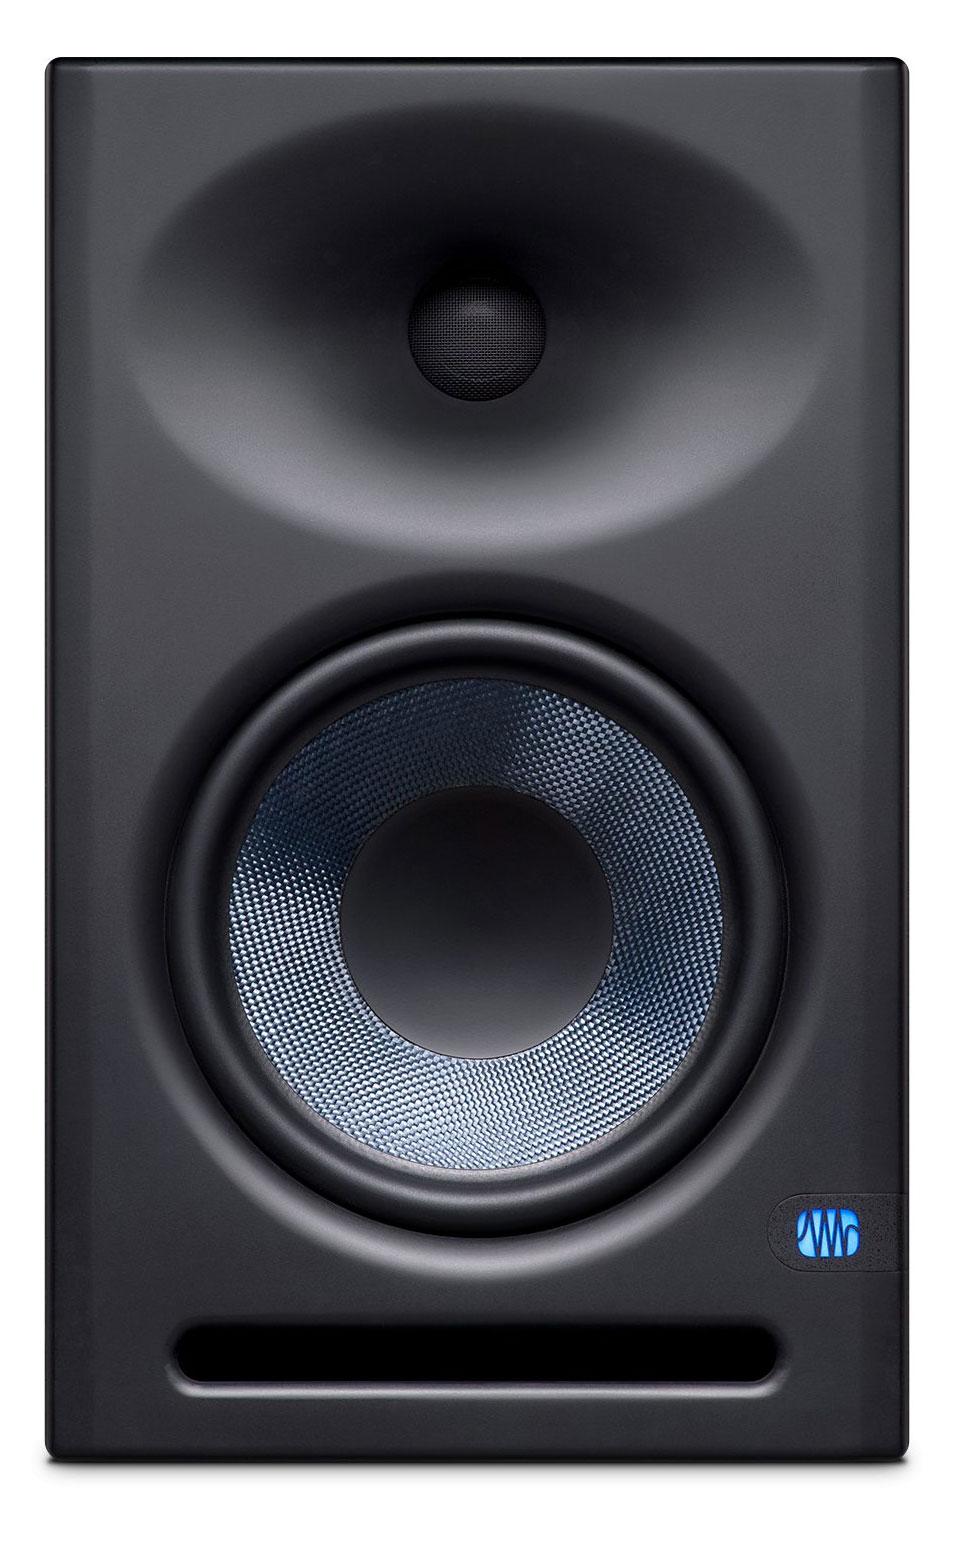 Studiomonitore - Presonus Eris E8 XT Aktiver Studiomonitor - Onlineshop Musikhaus Kirstein